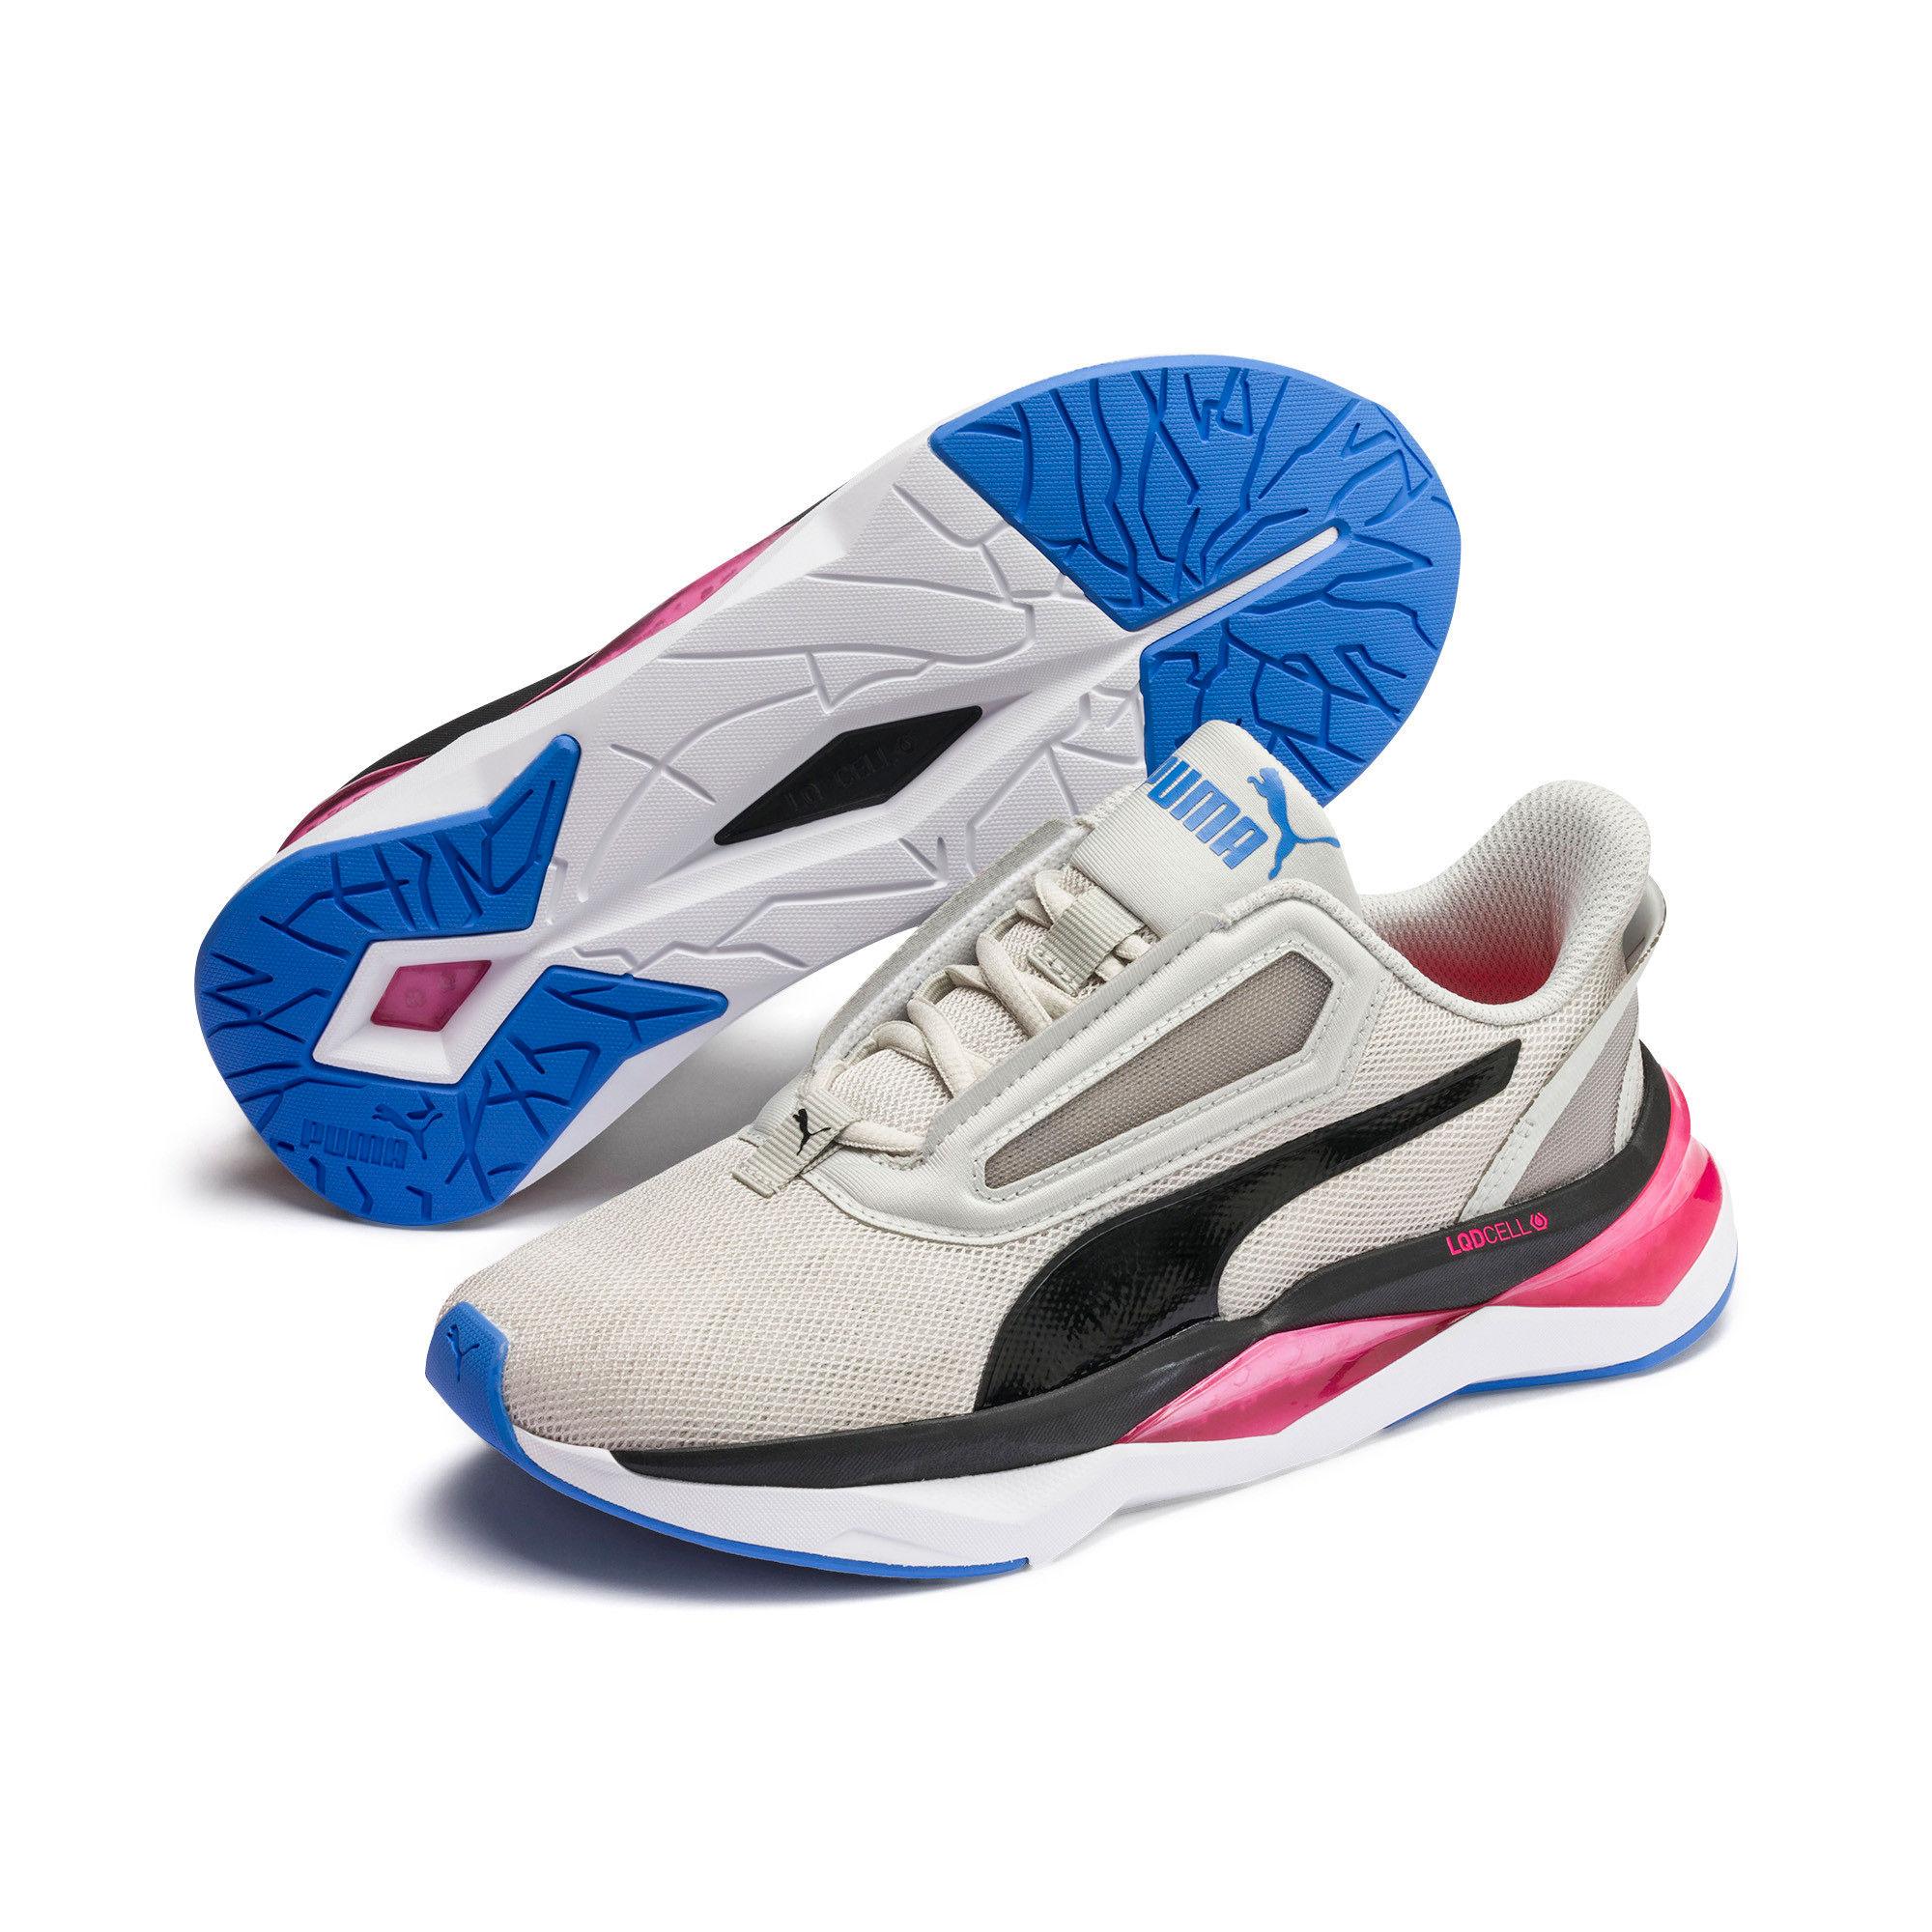 Puma LQDCell Shatter XT Shift Q4 Women's Shoes - Blue